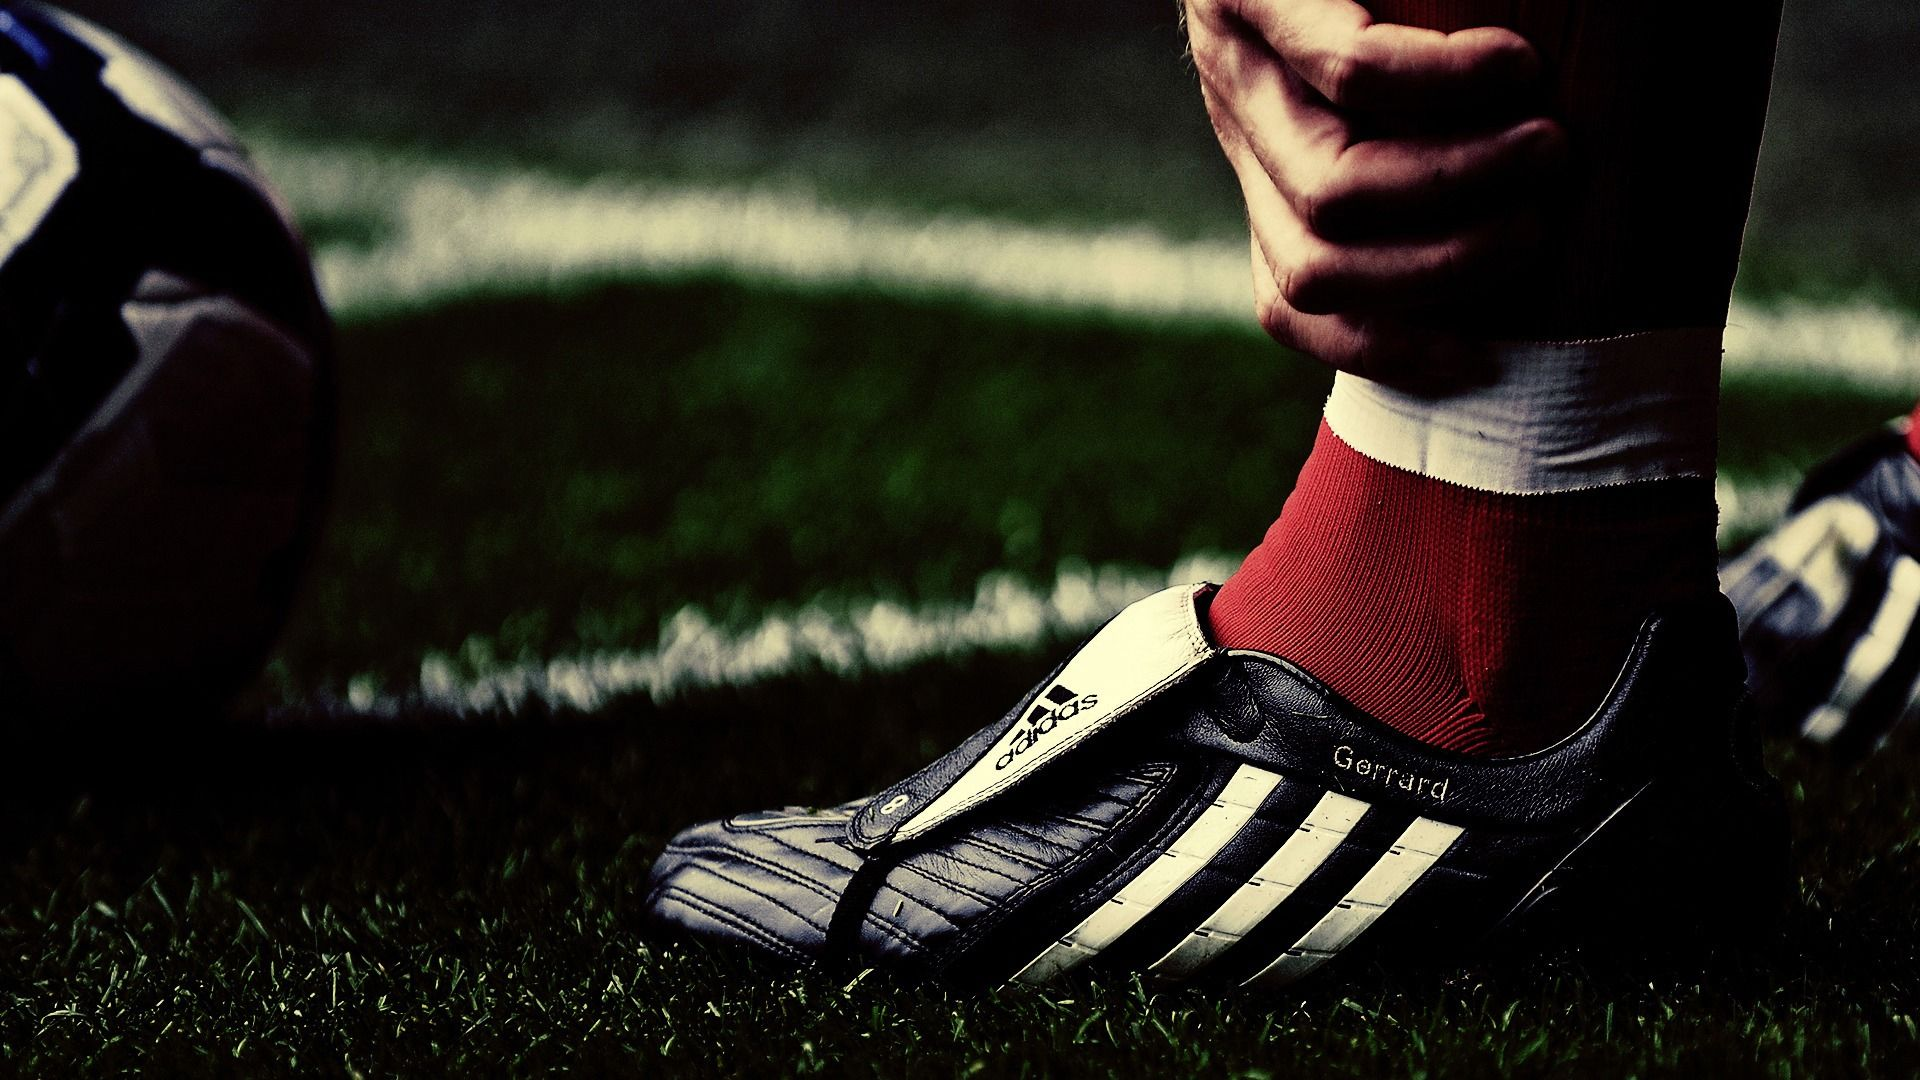 Adidas Soccer Shoe 1080p Hd Sports Wallpaper Adidas Soccer Shoes Soccer Shoes Nike Football Boots